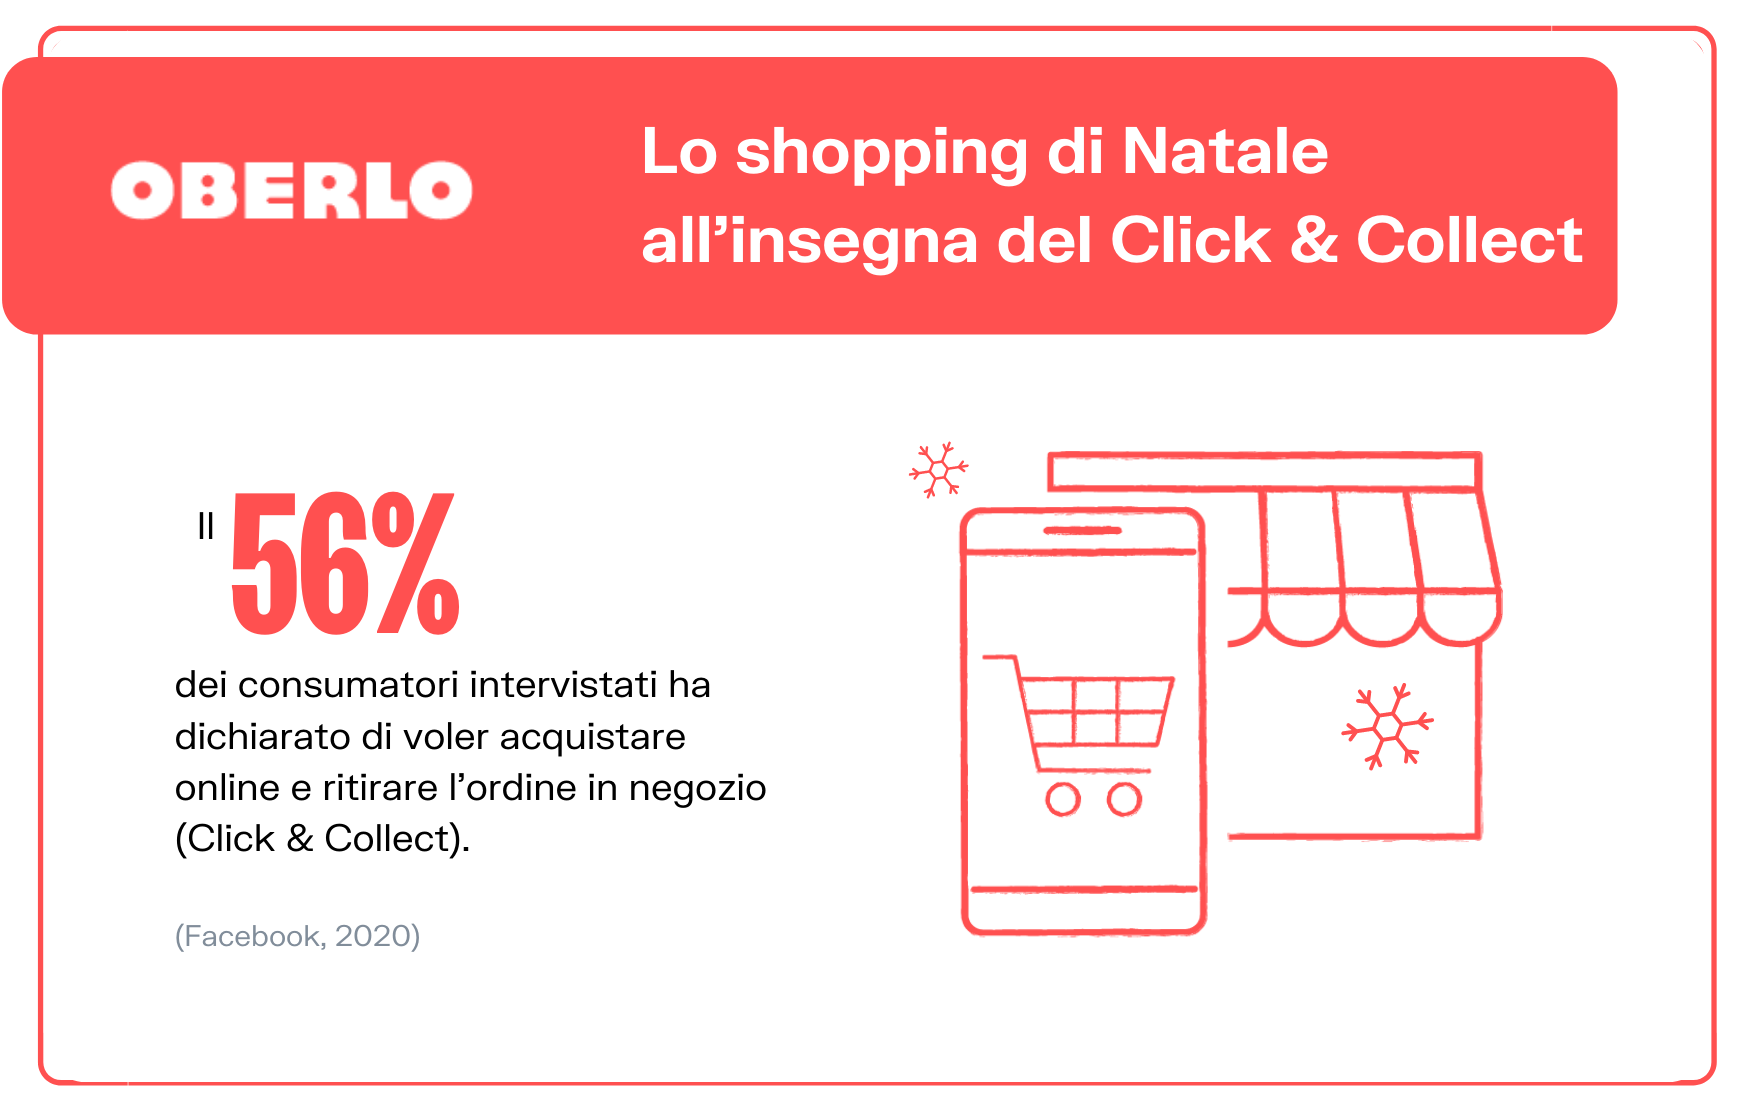 statistiche natale marketing